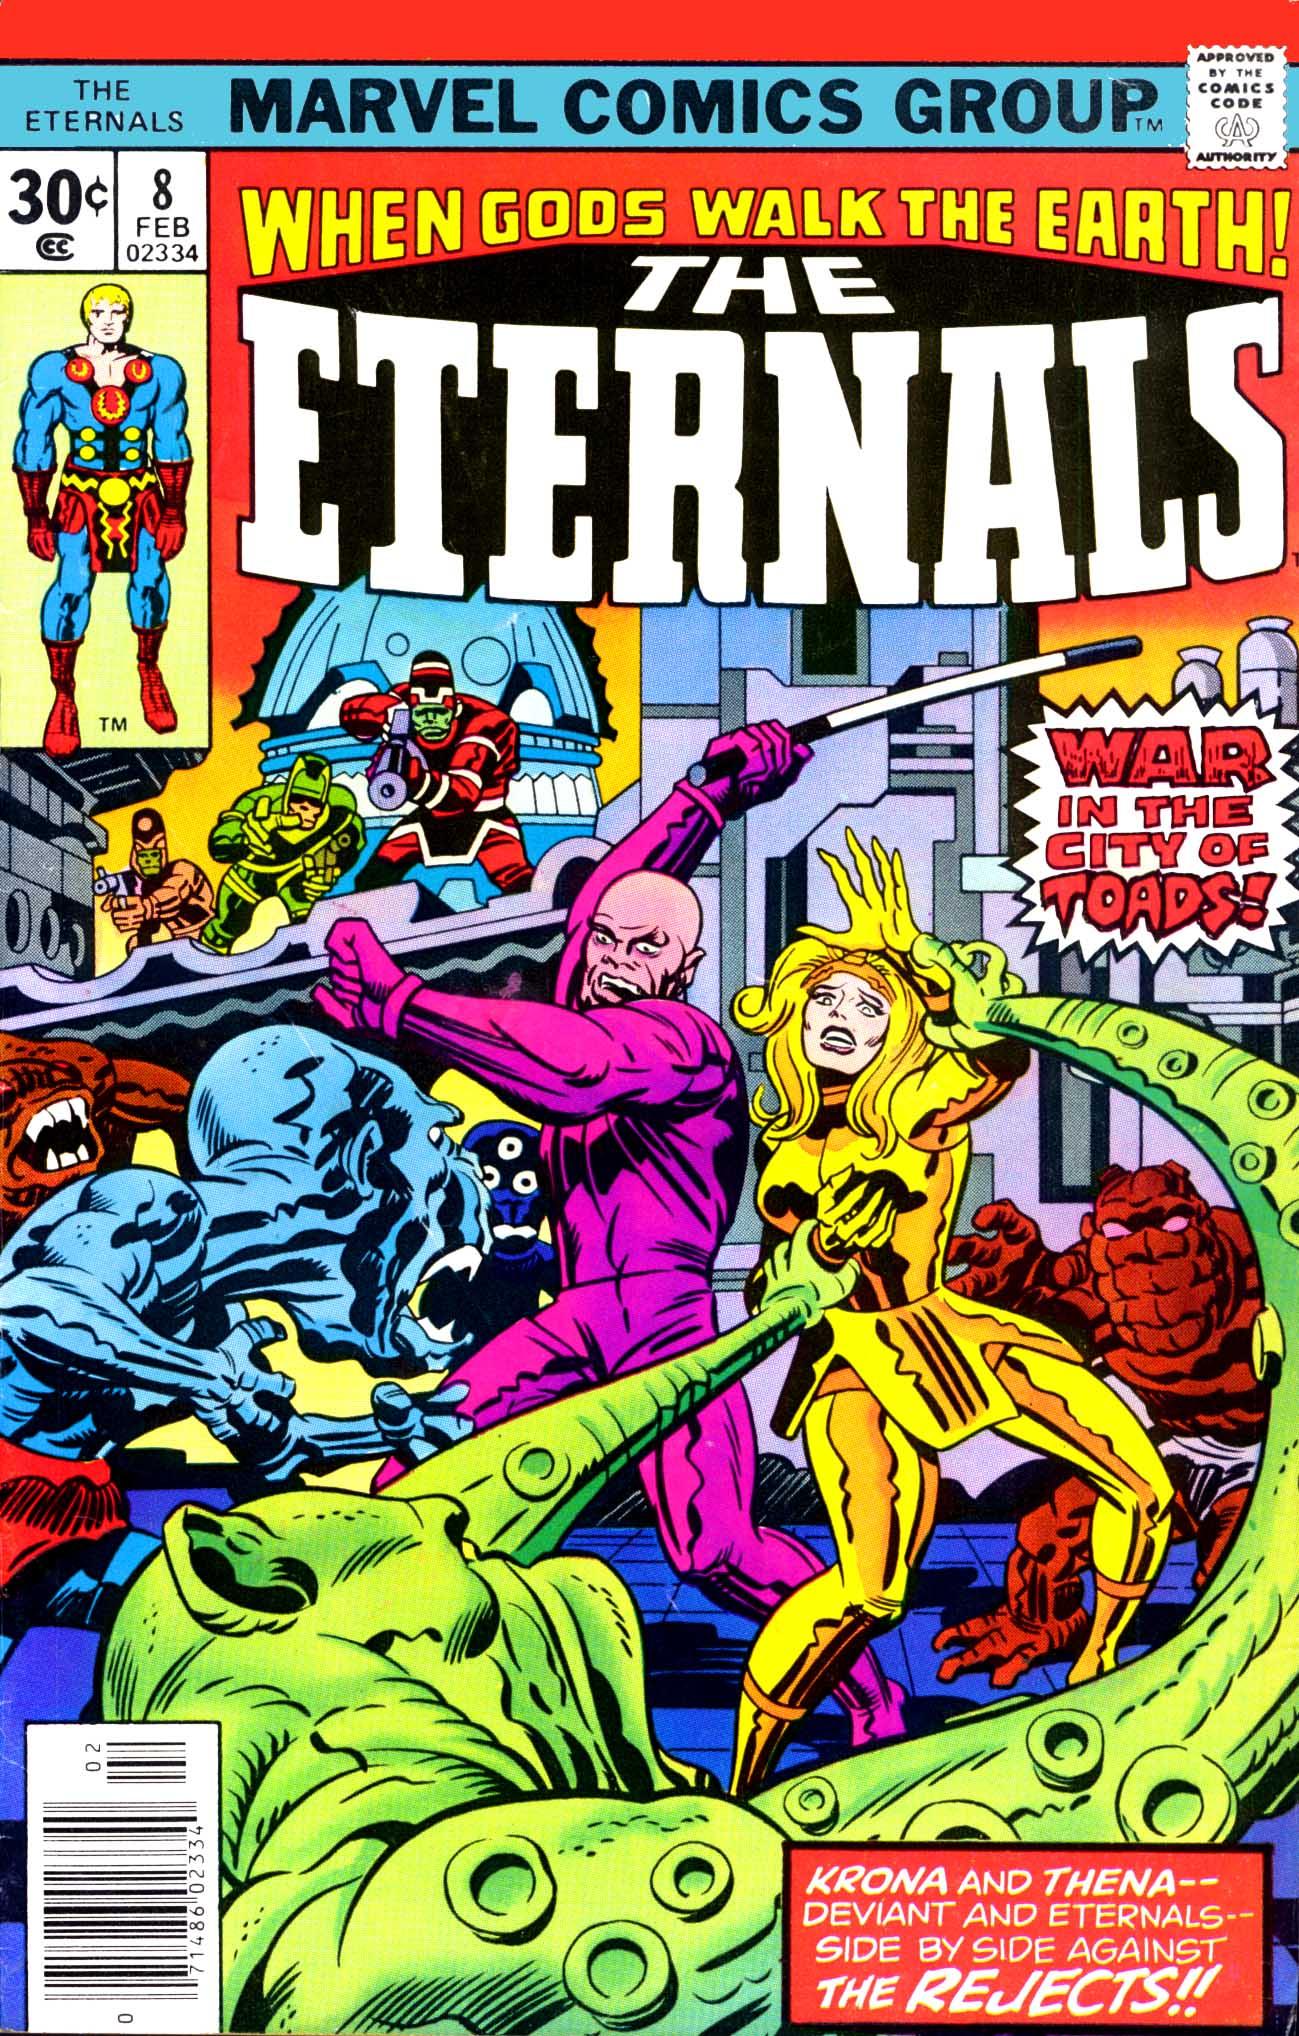 the eternals - photo #25